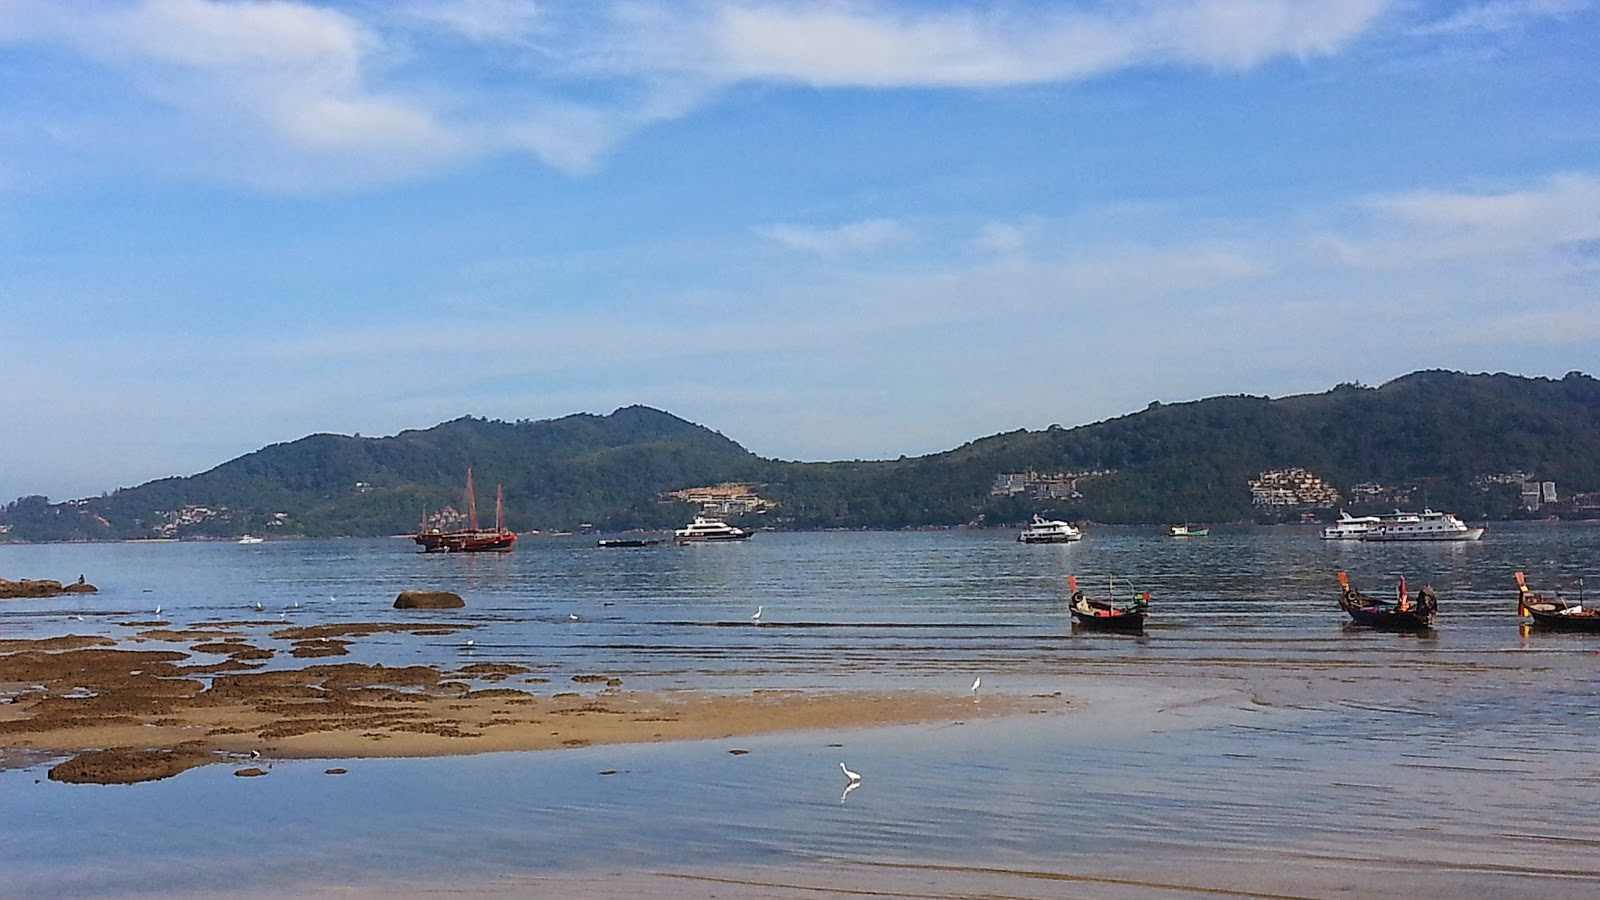 Patong Beach December 2014